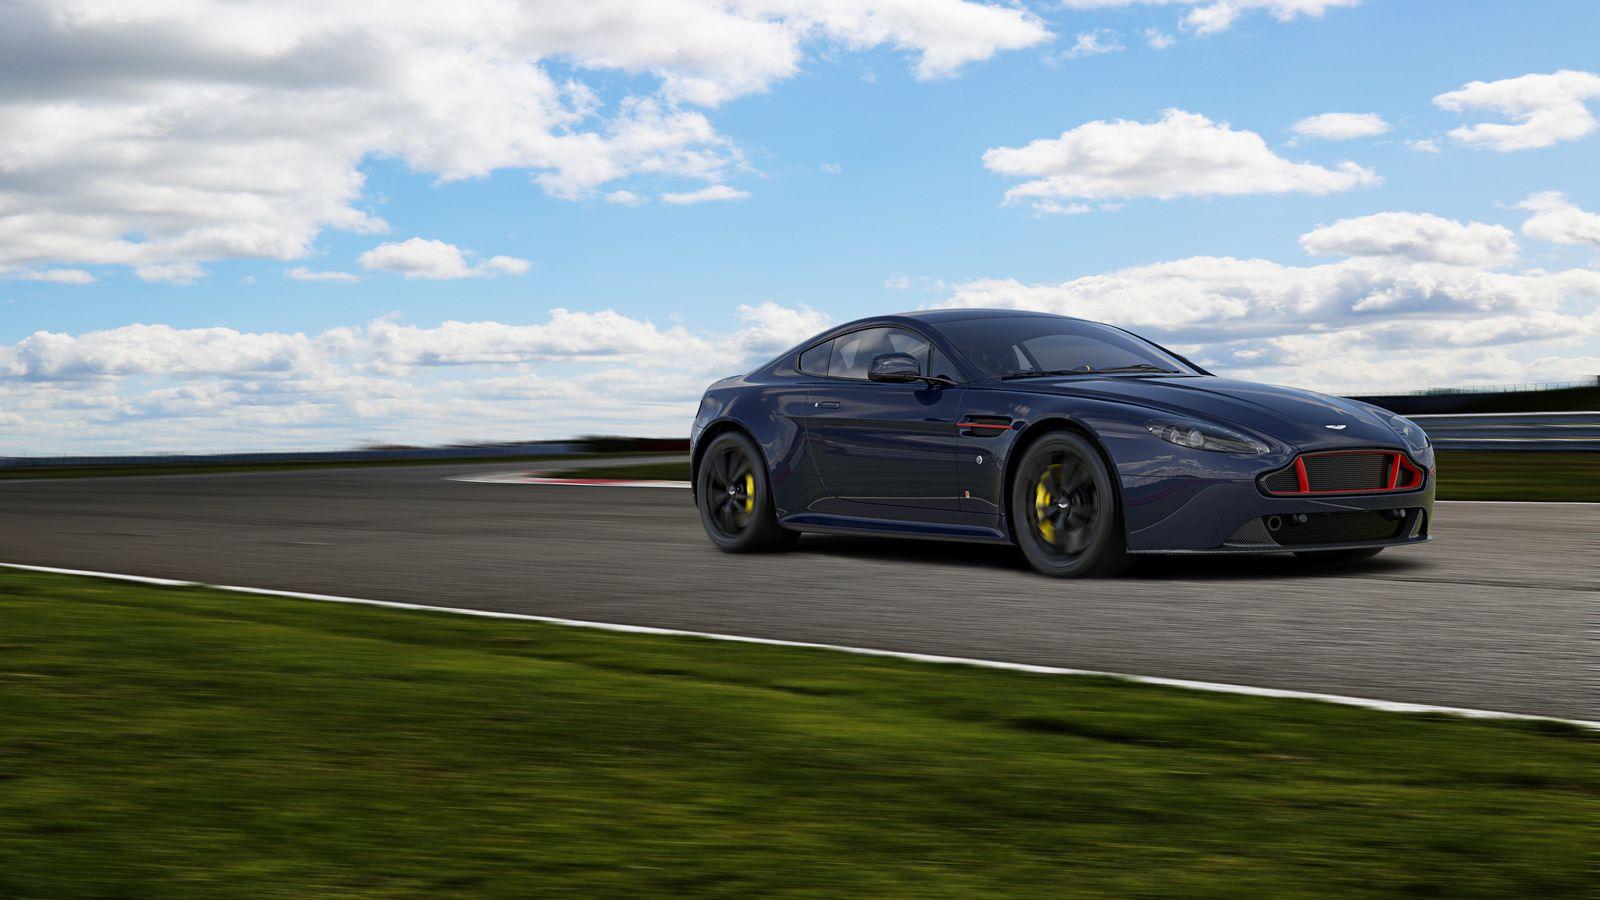 Aston Martin V8 and V12 Vantage Red Bull Racing Editions (17)